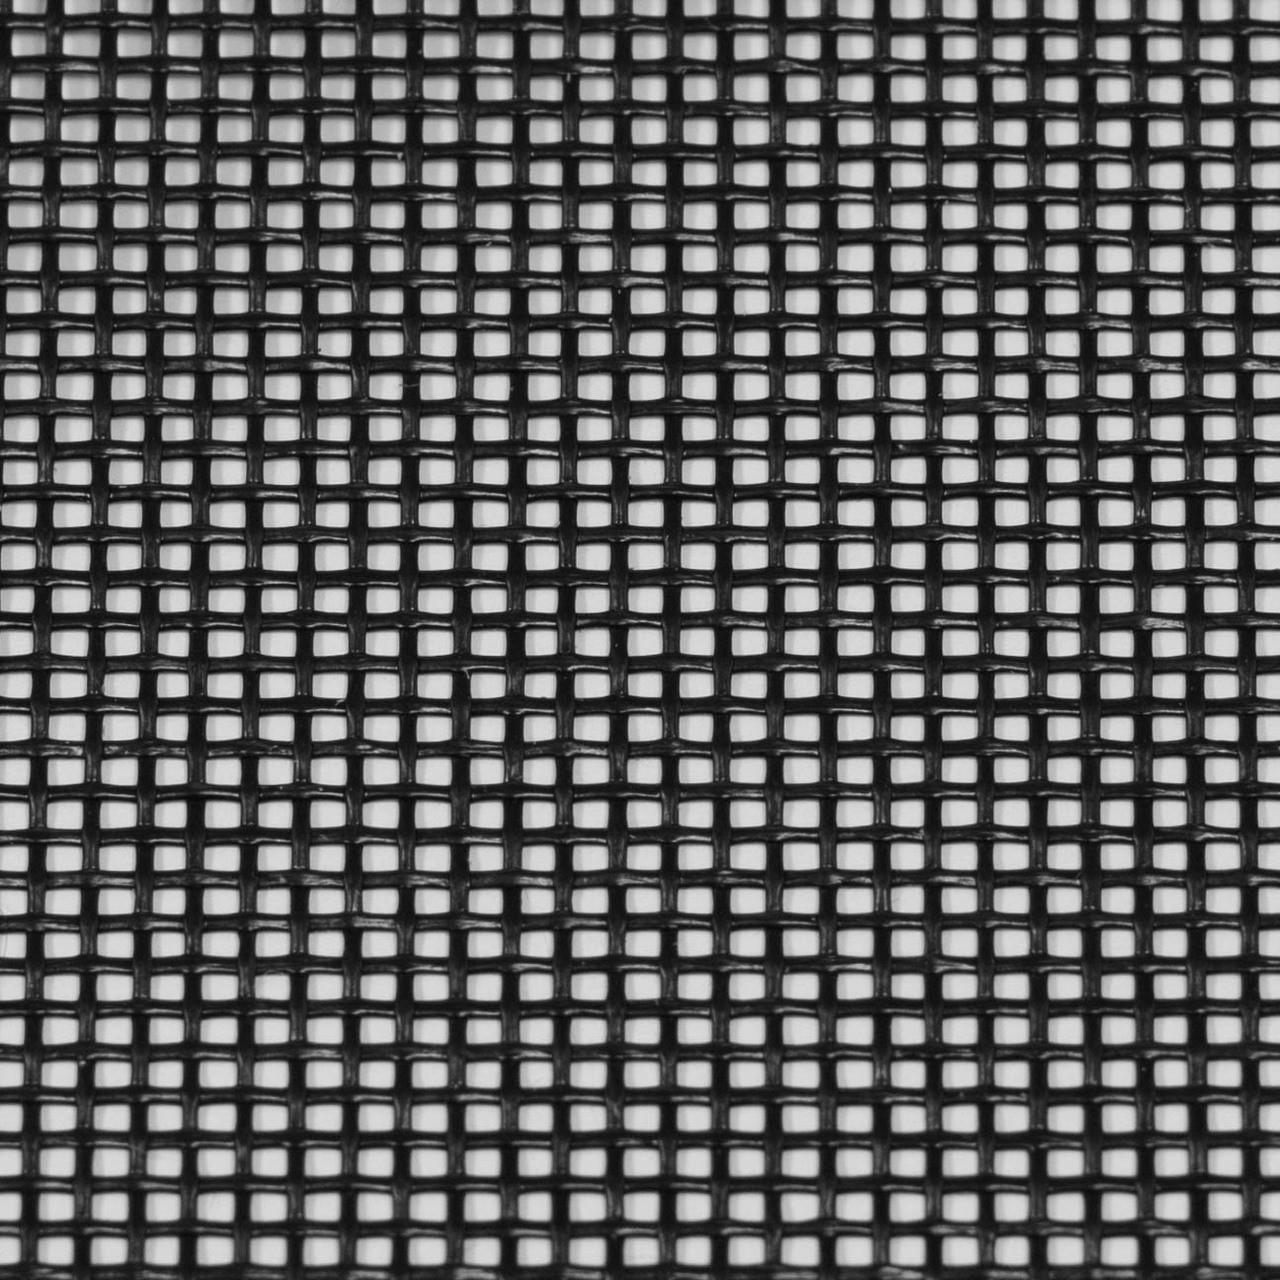 96 Inch x 25 Ft Super Screen Tiny Mesh 20 x 17